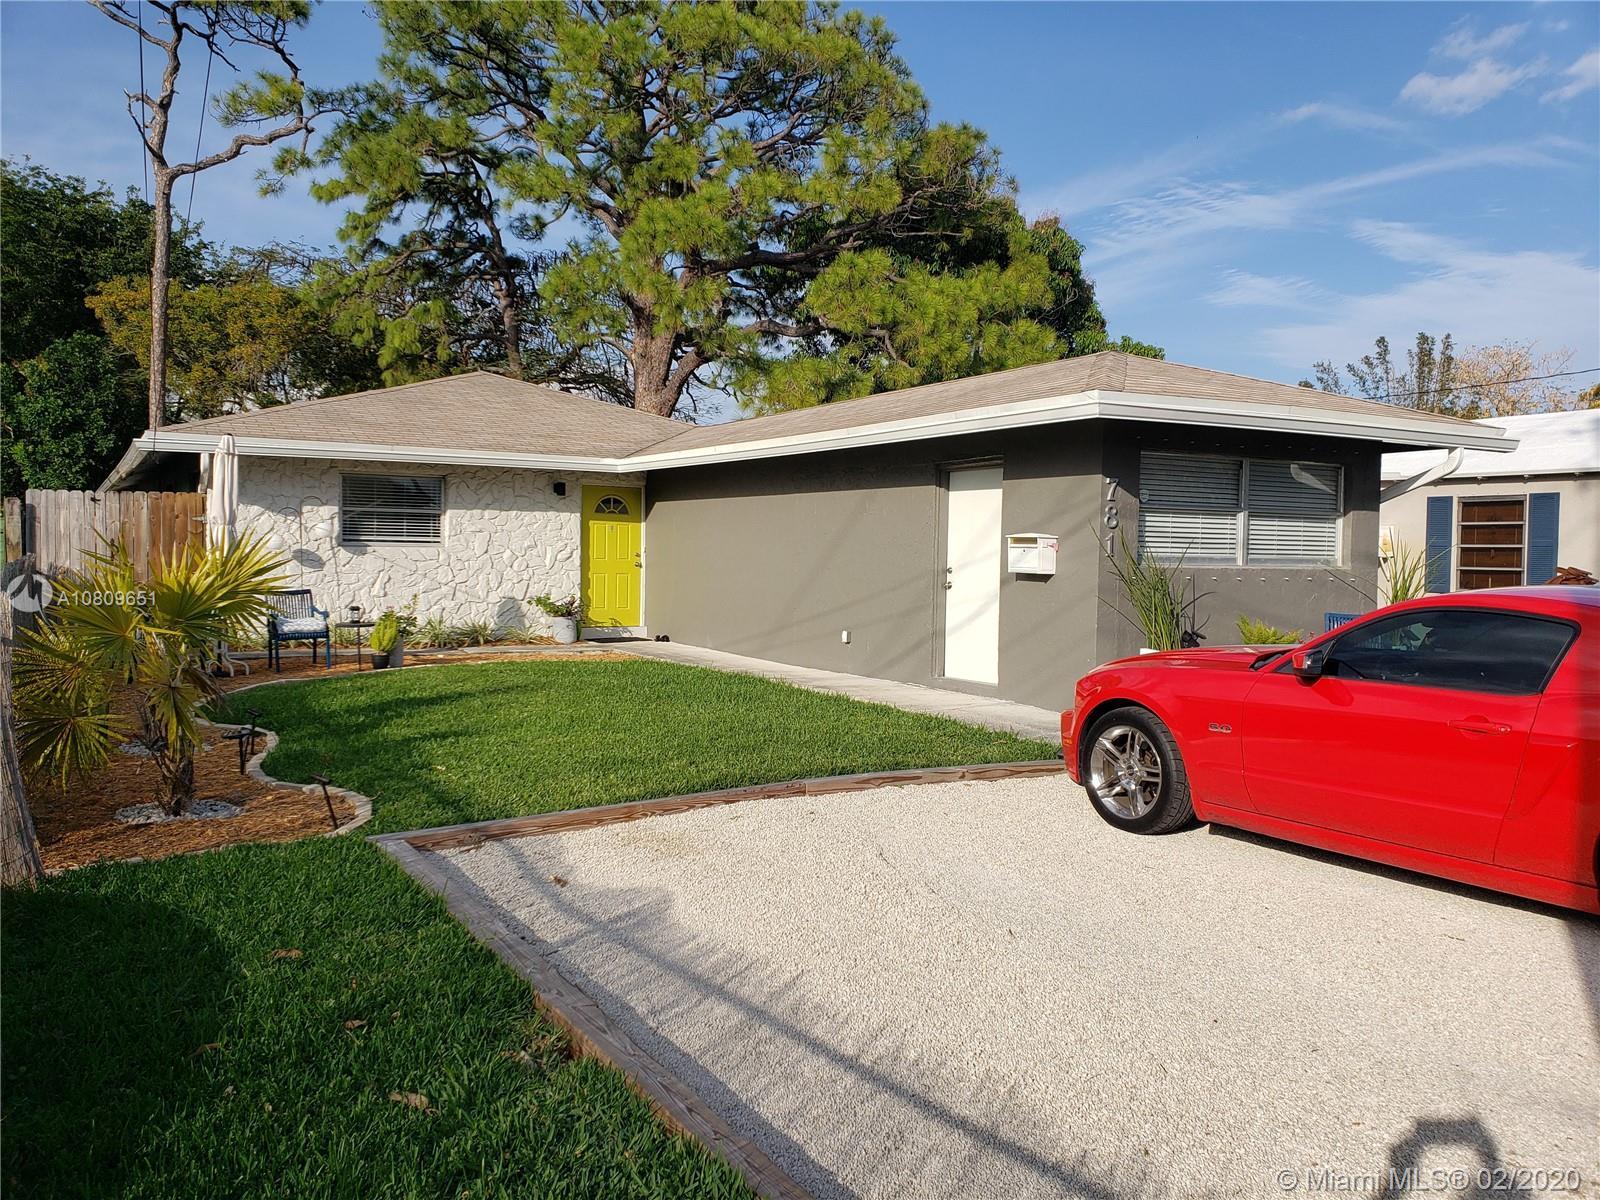 781 NE 37th St - Oakland Park, Florida